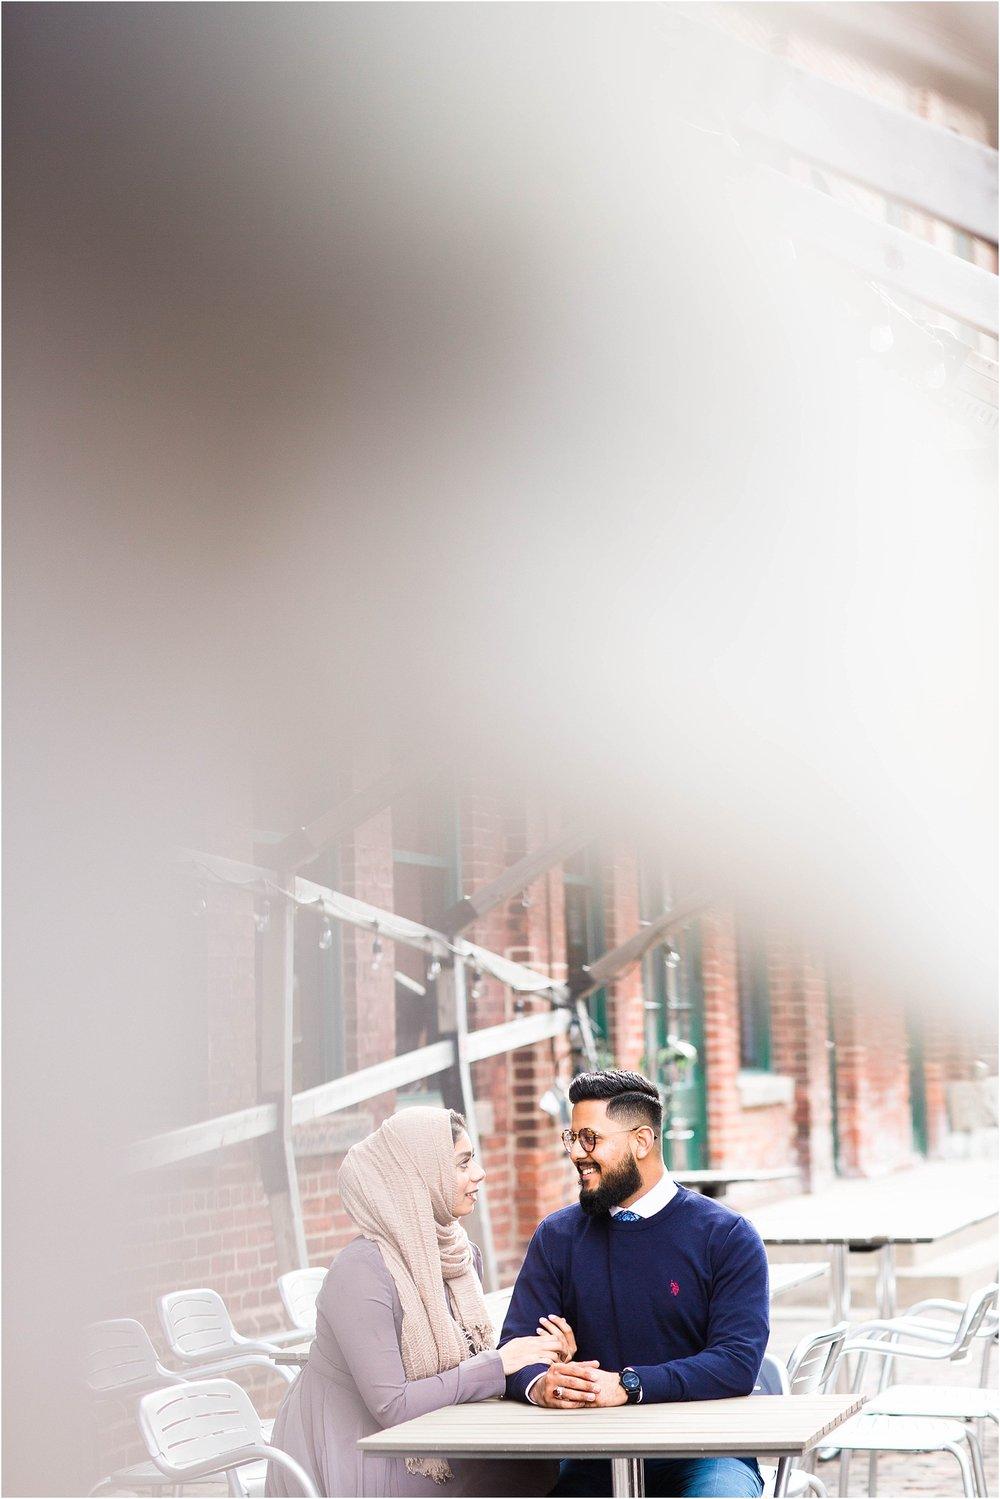 Polson-Pier-Distillery-District-Engagement-Session-Toronto-Mississauga-Brampton-Scarborough-GTA-Pakistani-Indian-Wedding-Engagement-Photographer-Photography_0035.jpg